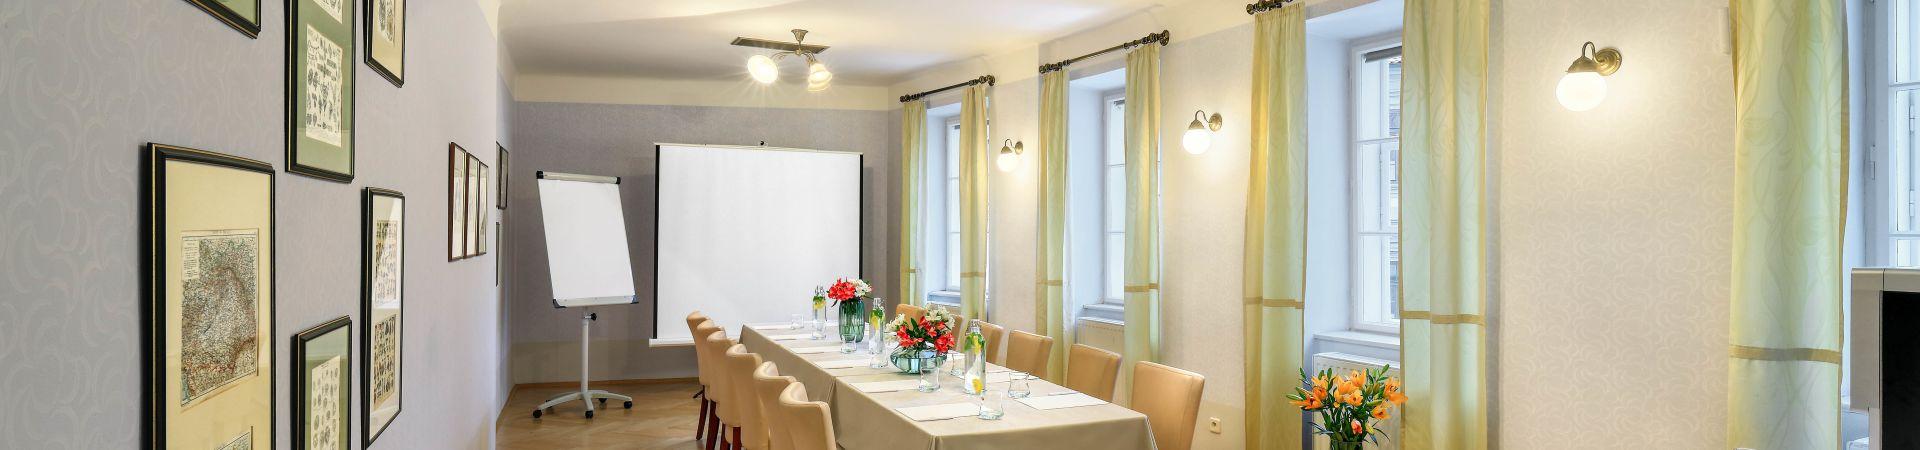 Bellevue Hotel Český Krumlov - Rosenberg